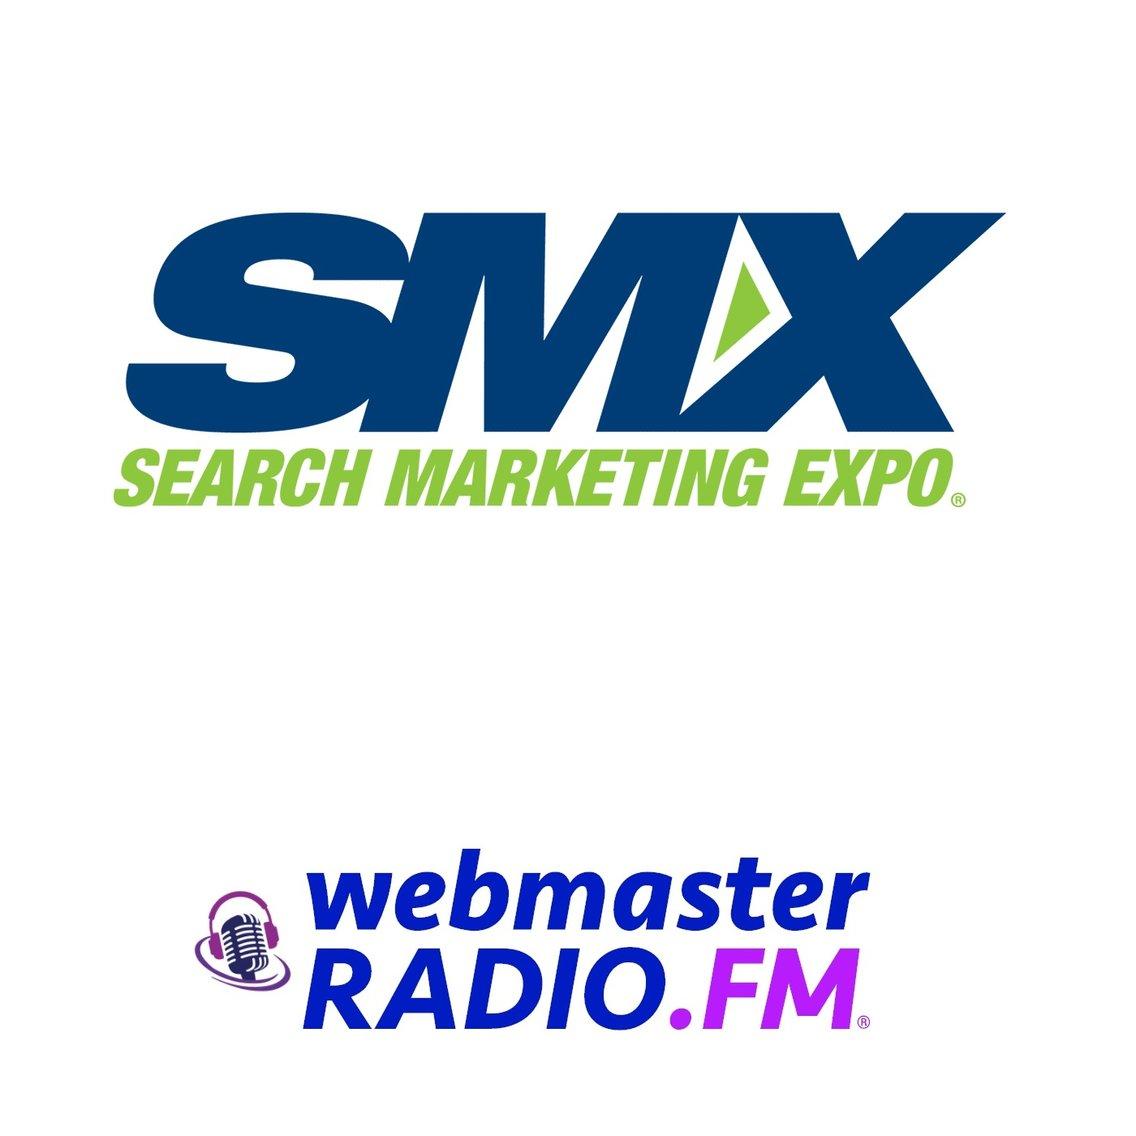 Search Marketing Expo - imagen de portada